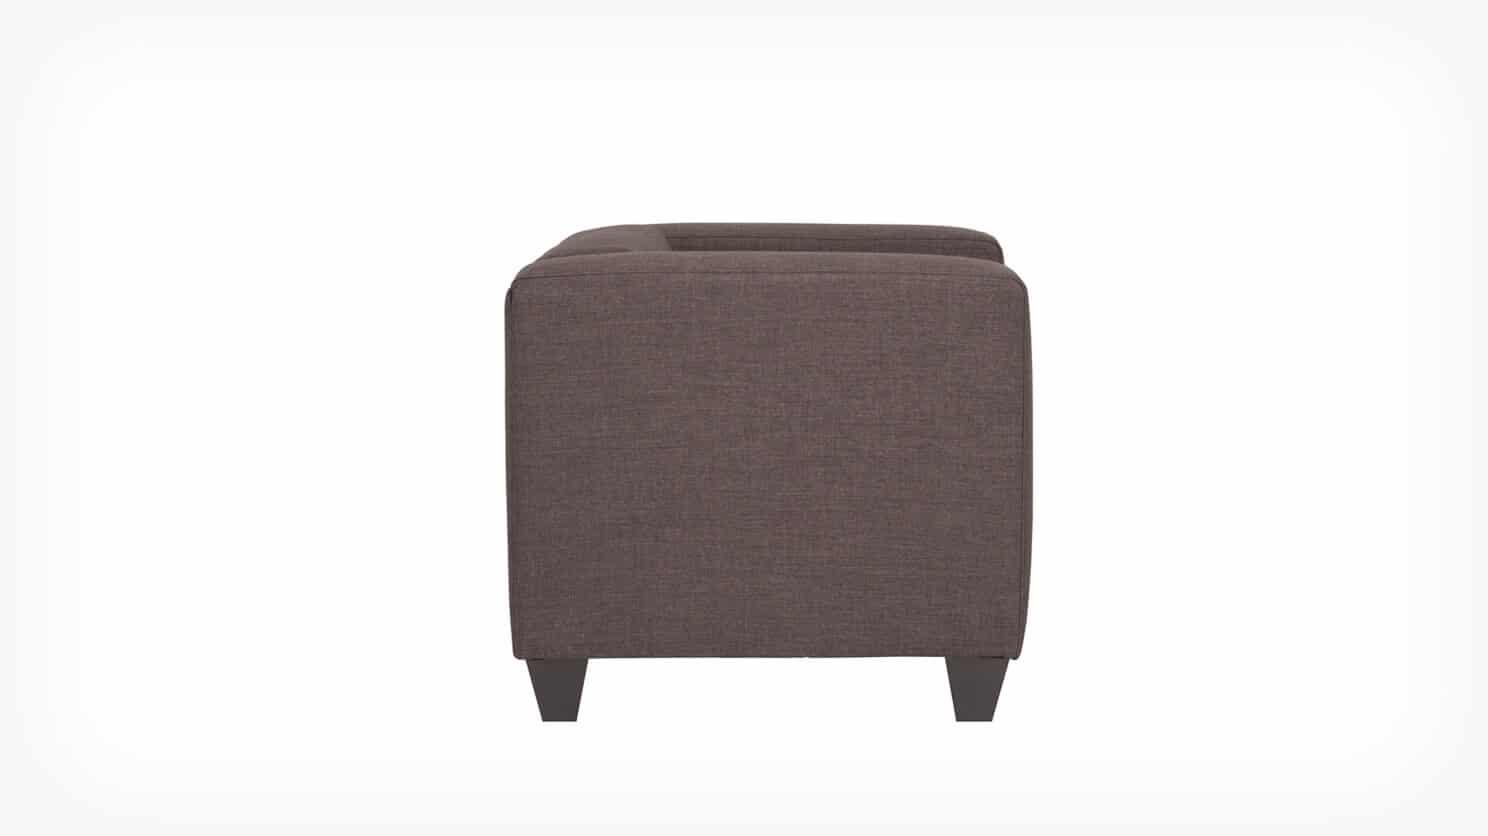 30042 02 3 chairs stella chair polo slate side